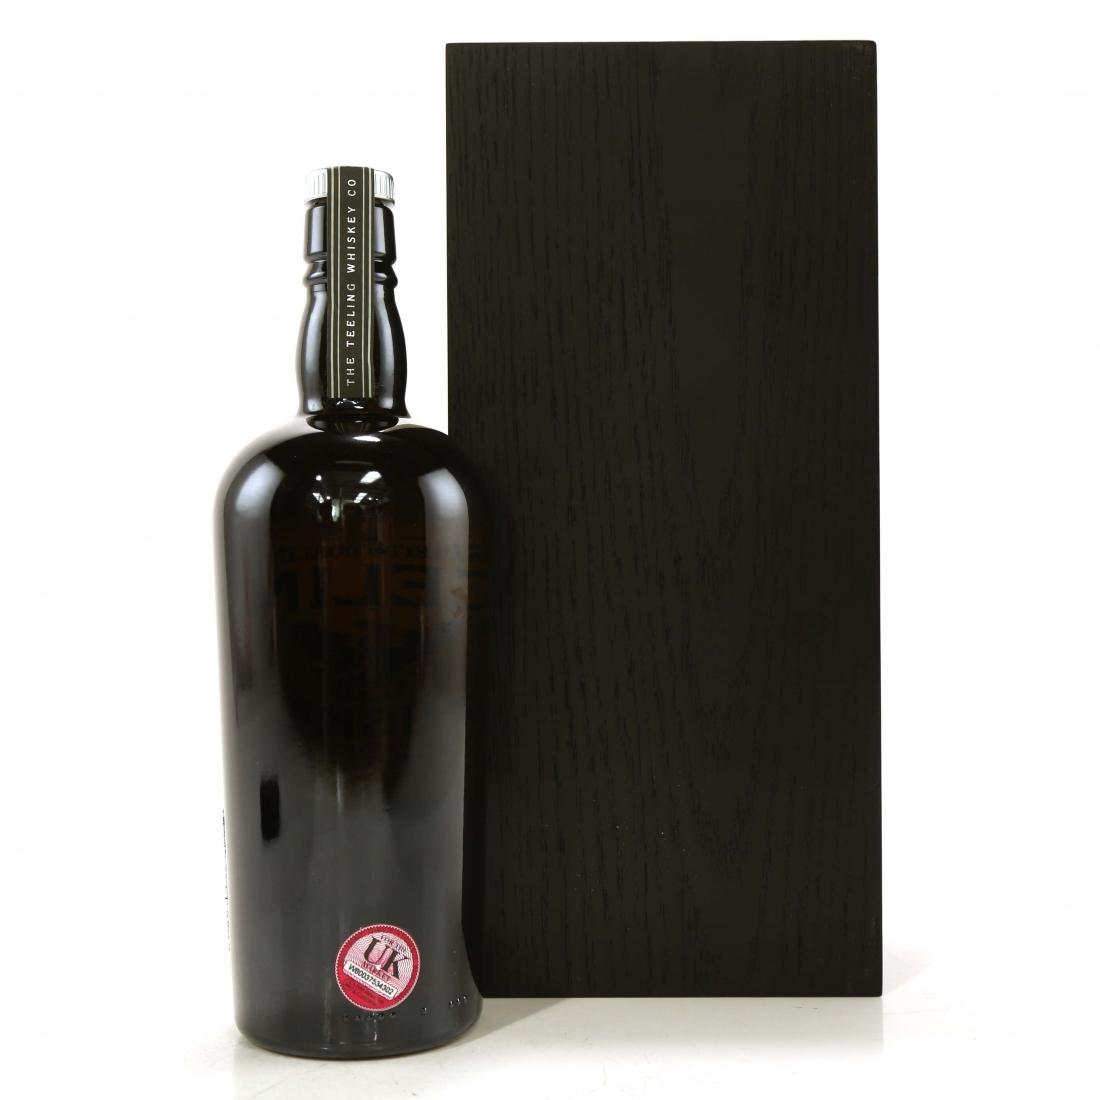 Teeling Celebratory Single Pot Still Whiskey / Bottle #065